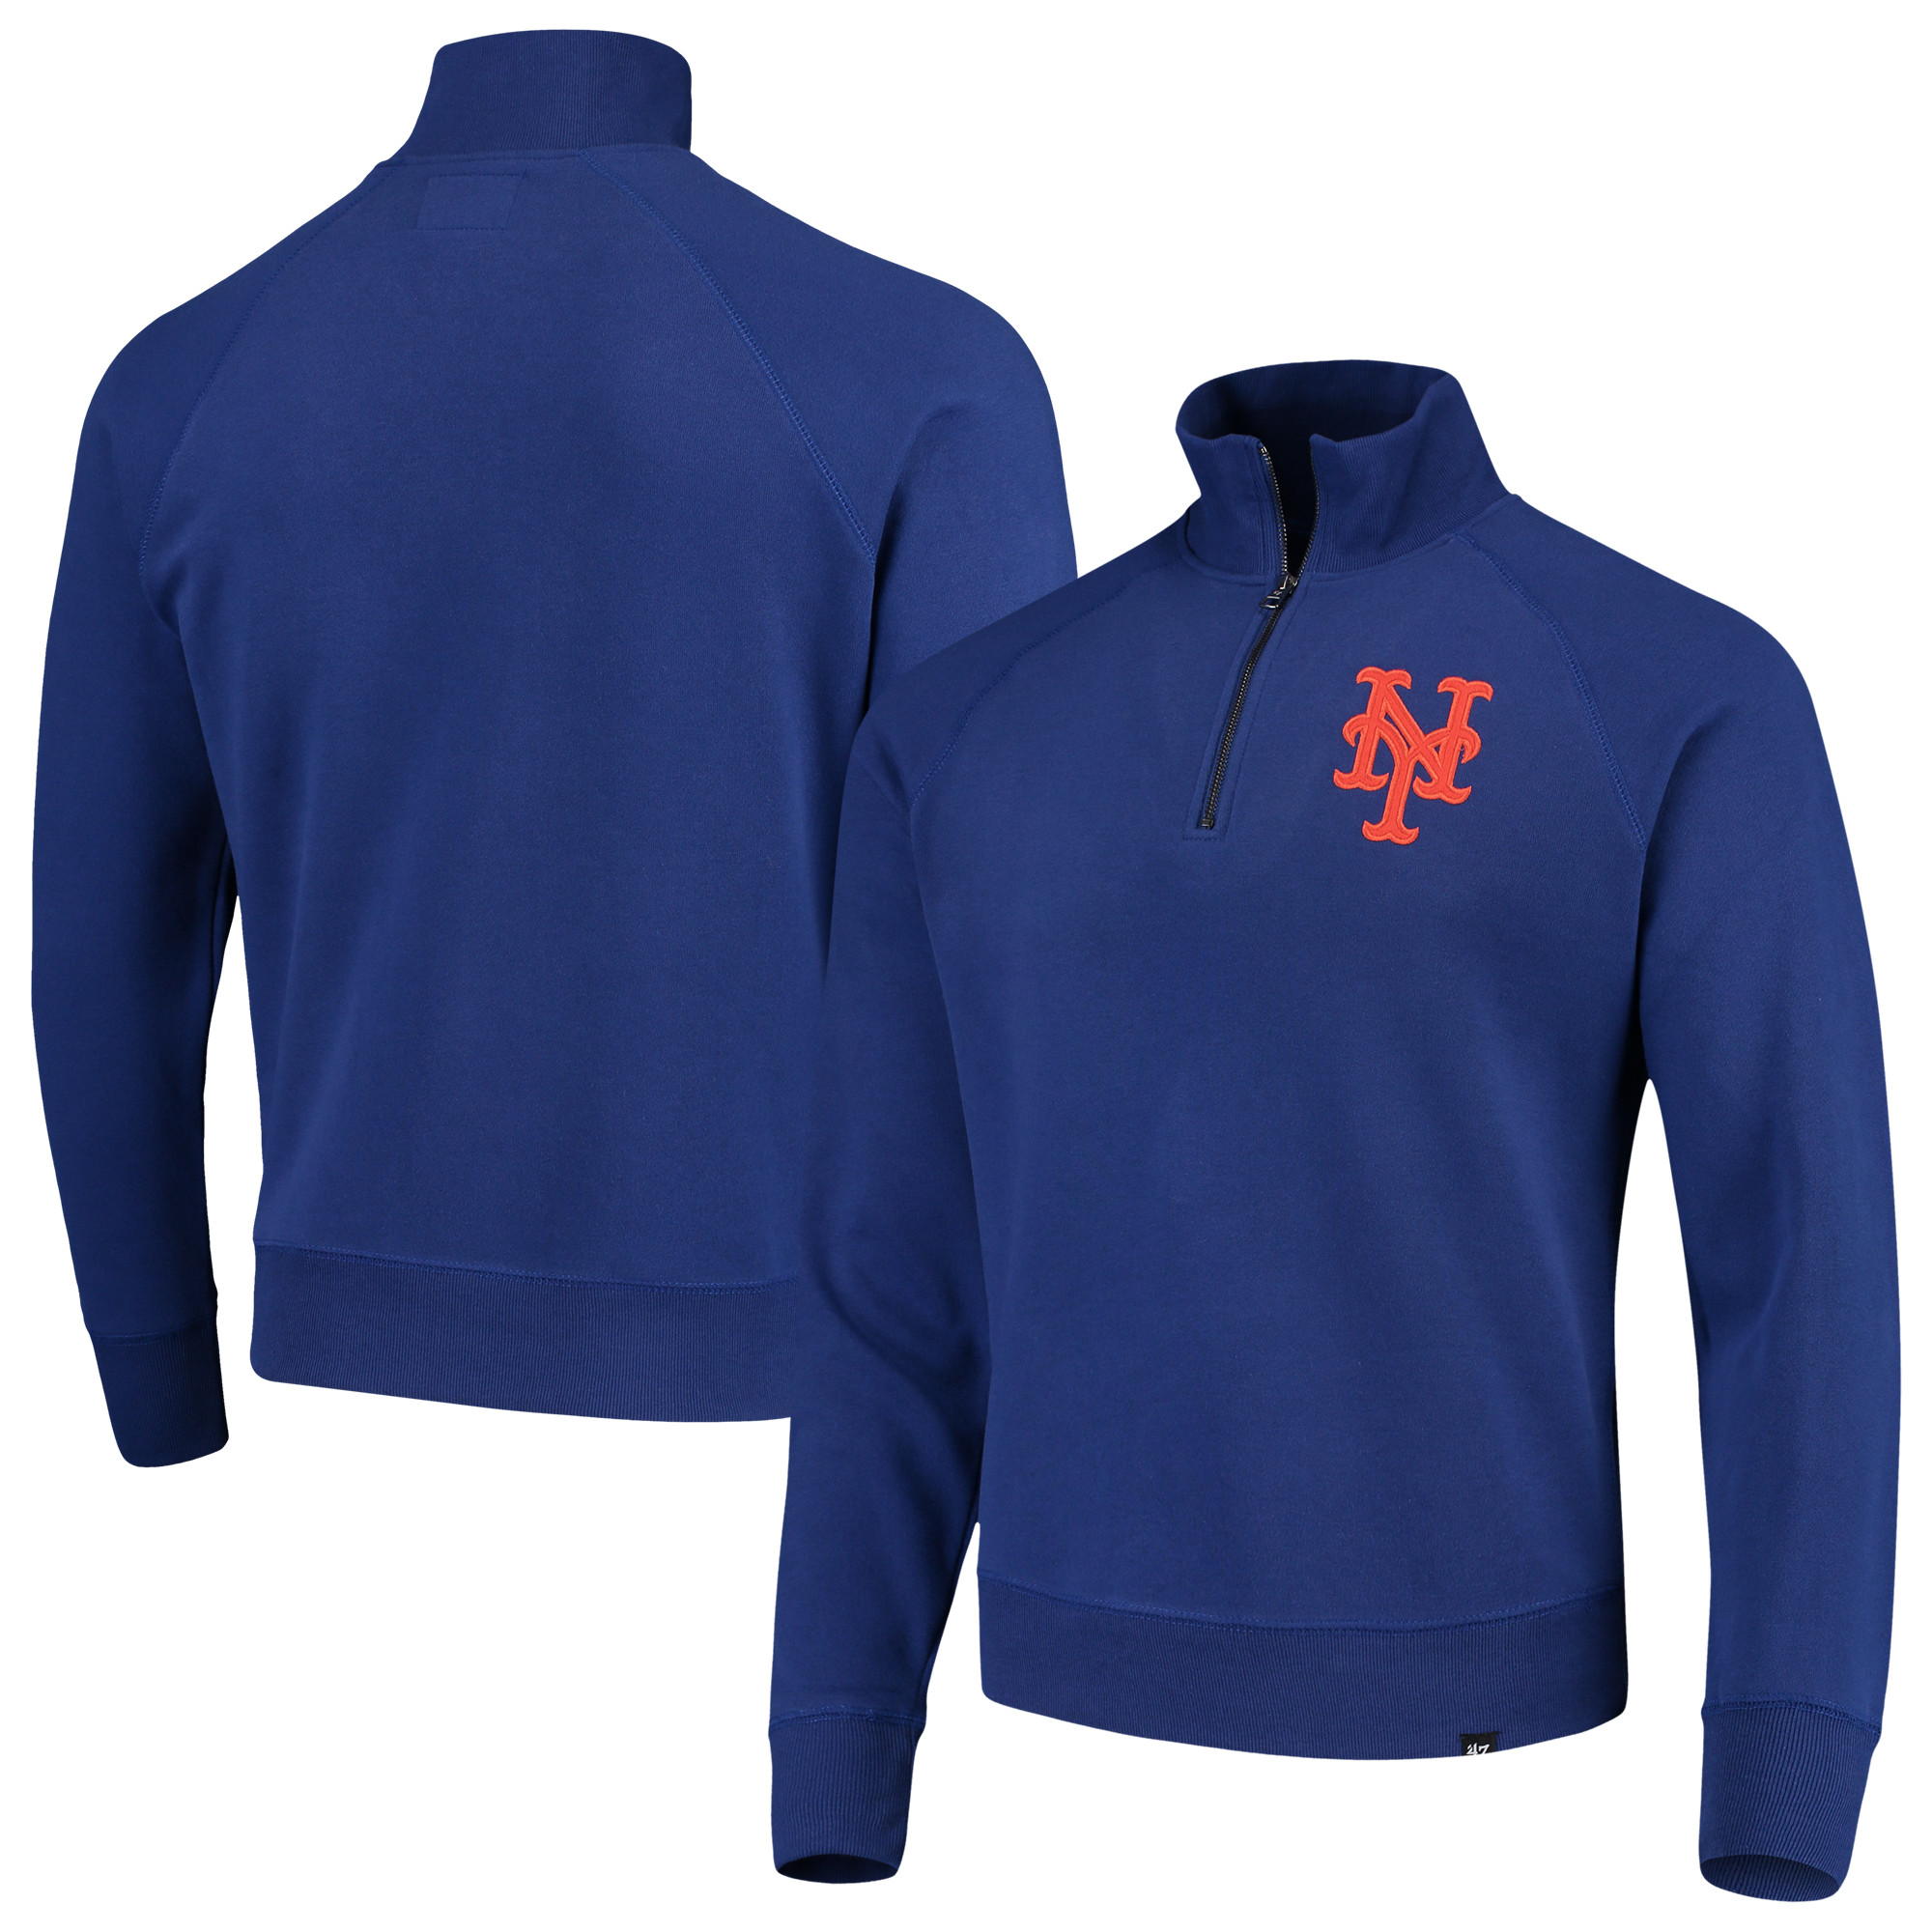 New York Mets '47 MLB Headline Quarter-Zip Pullover Jacket - Royal